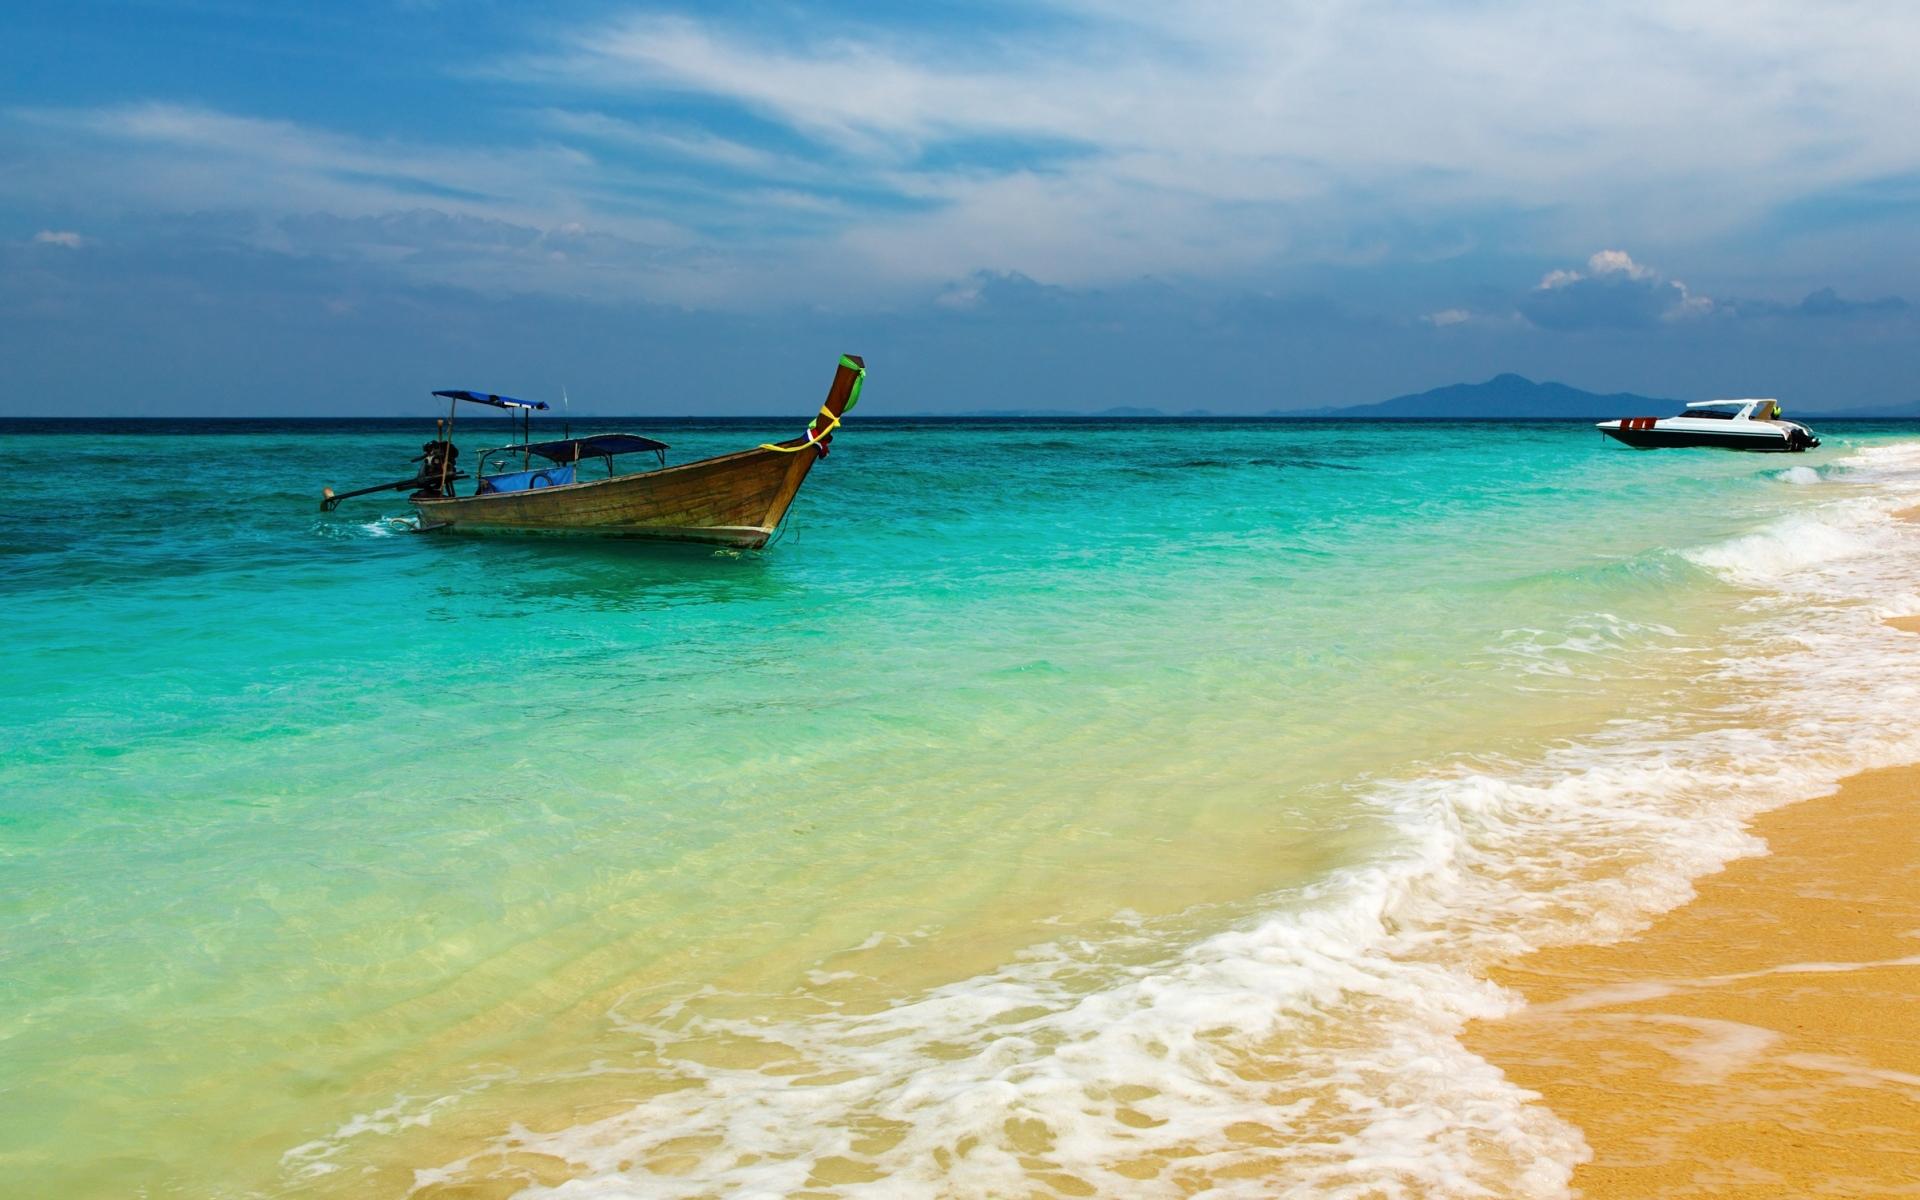 Картинки Лодка, берег, дерево, пена, песок, синяя вода, отдых, курорт, залив фото и обои на рабочий стол